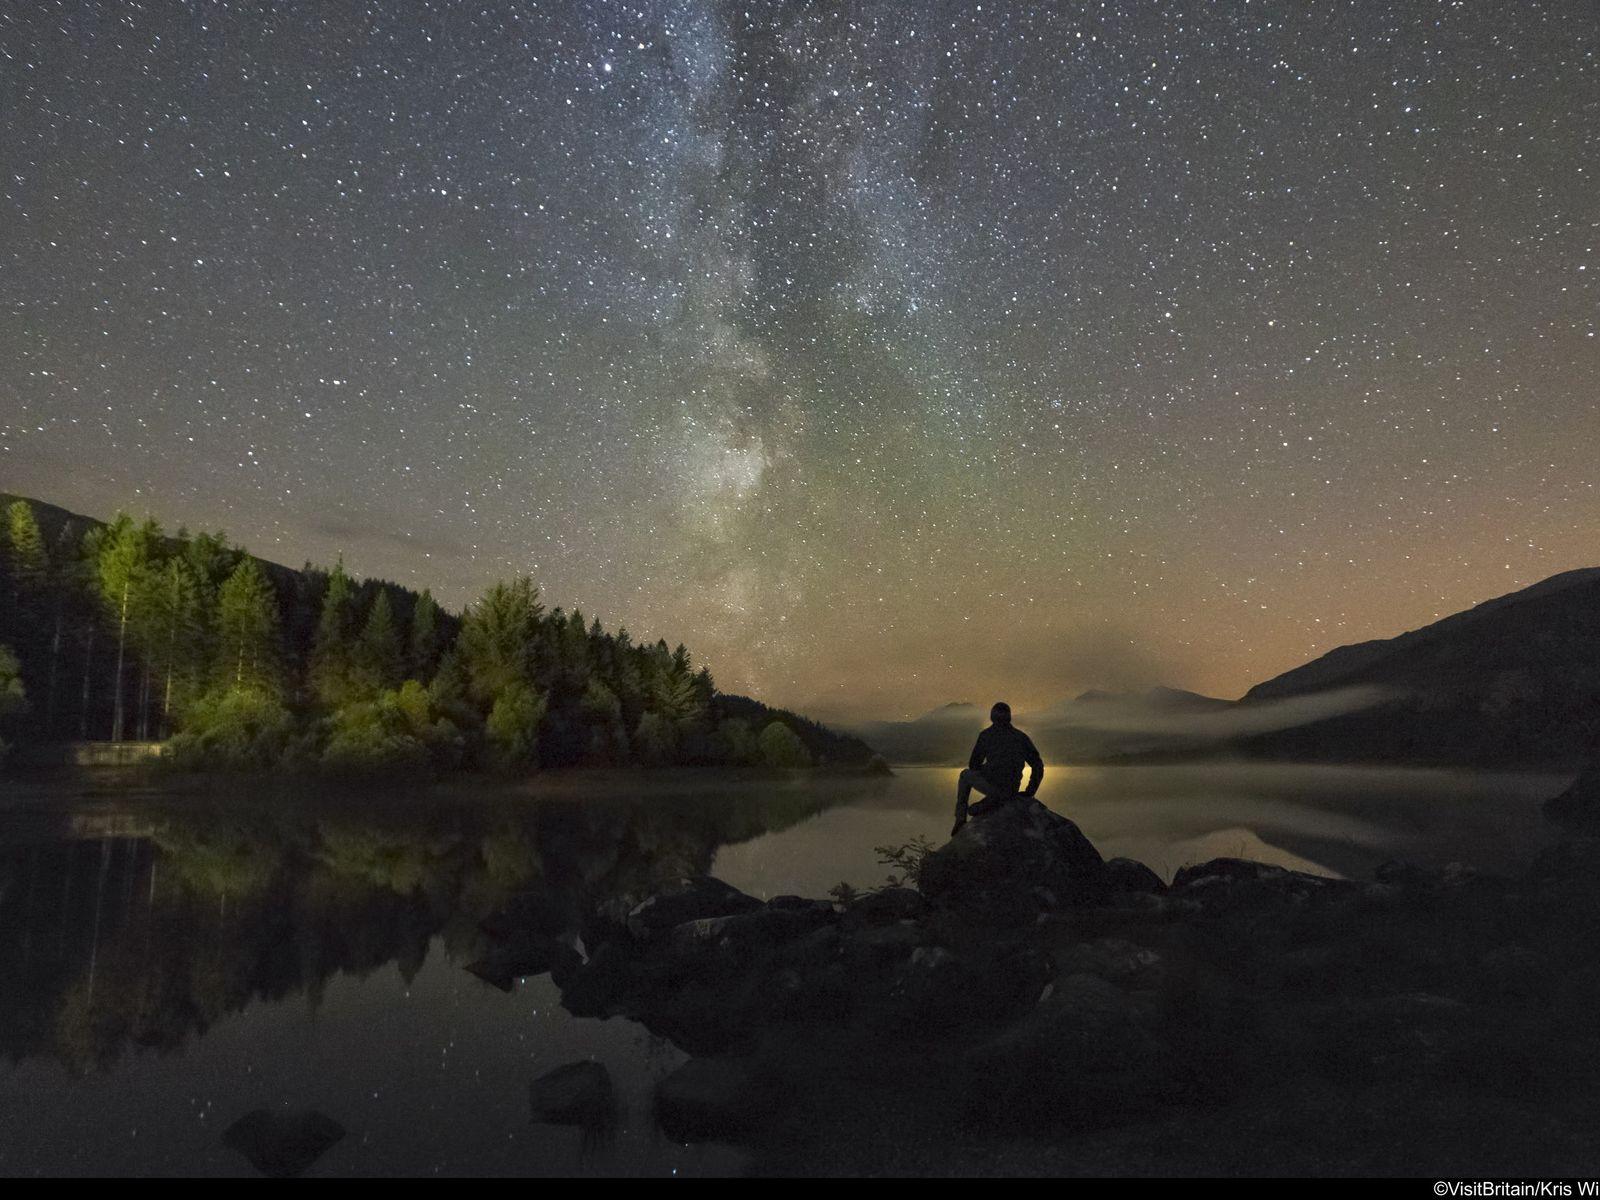 Stargazing at Snowdonia International Dark Sky Reserve, Wales.